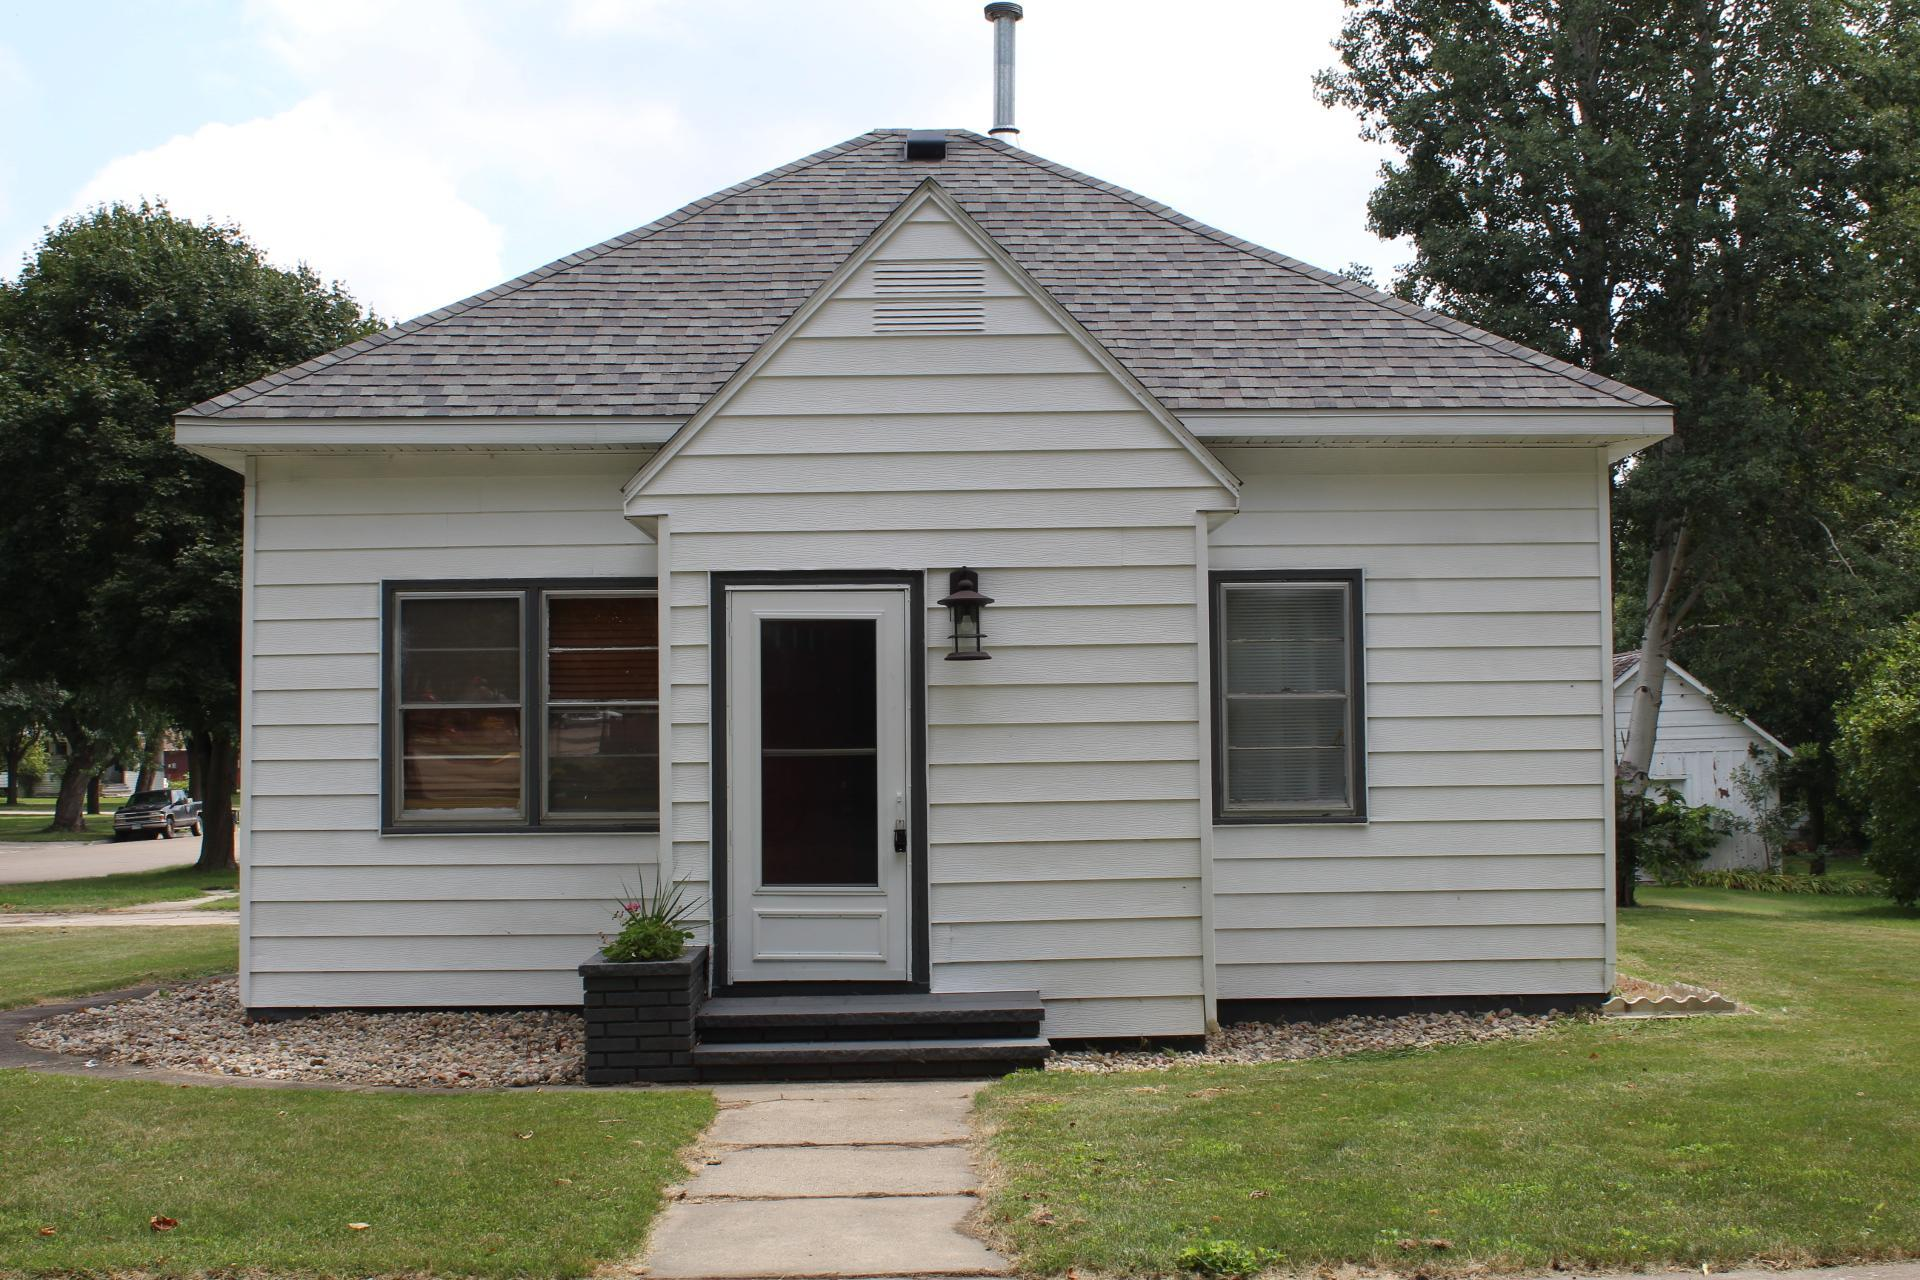 310 N Estey Street Property Photo - Luverne, MN real estate listing